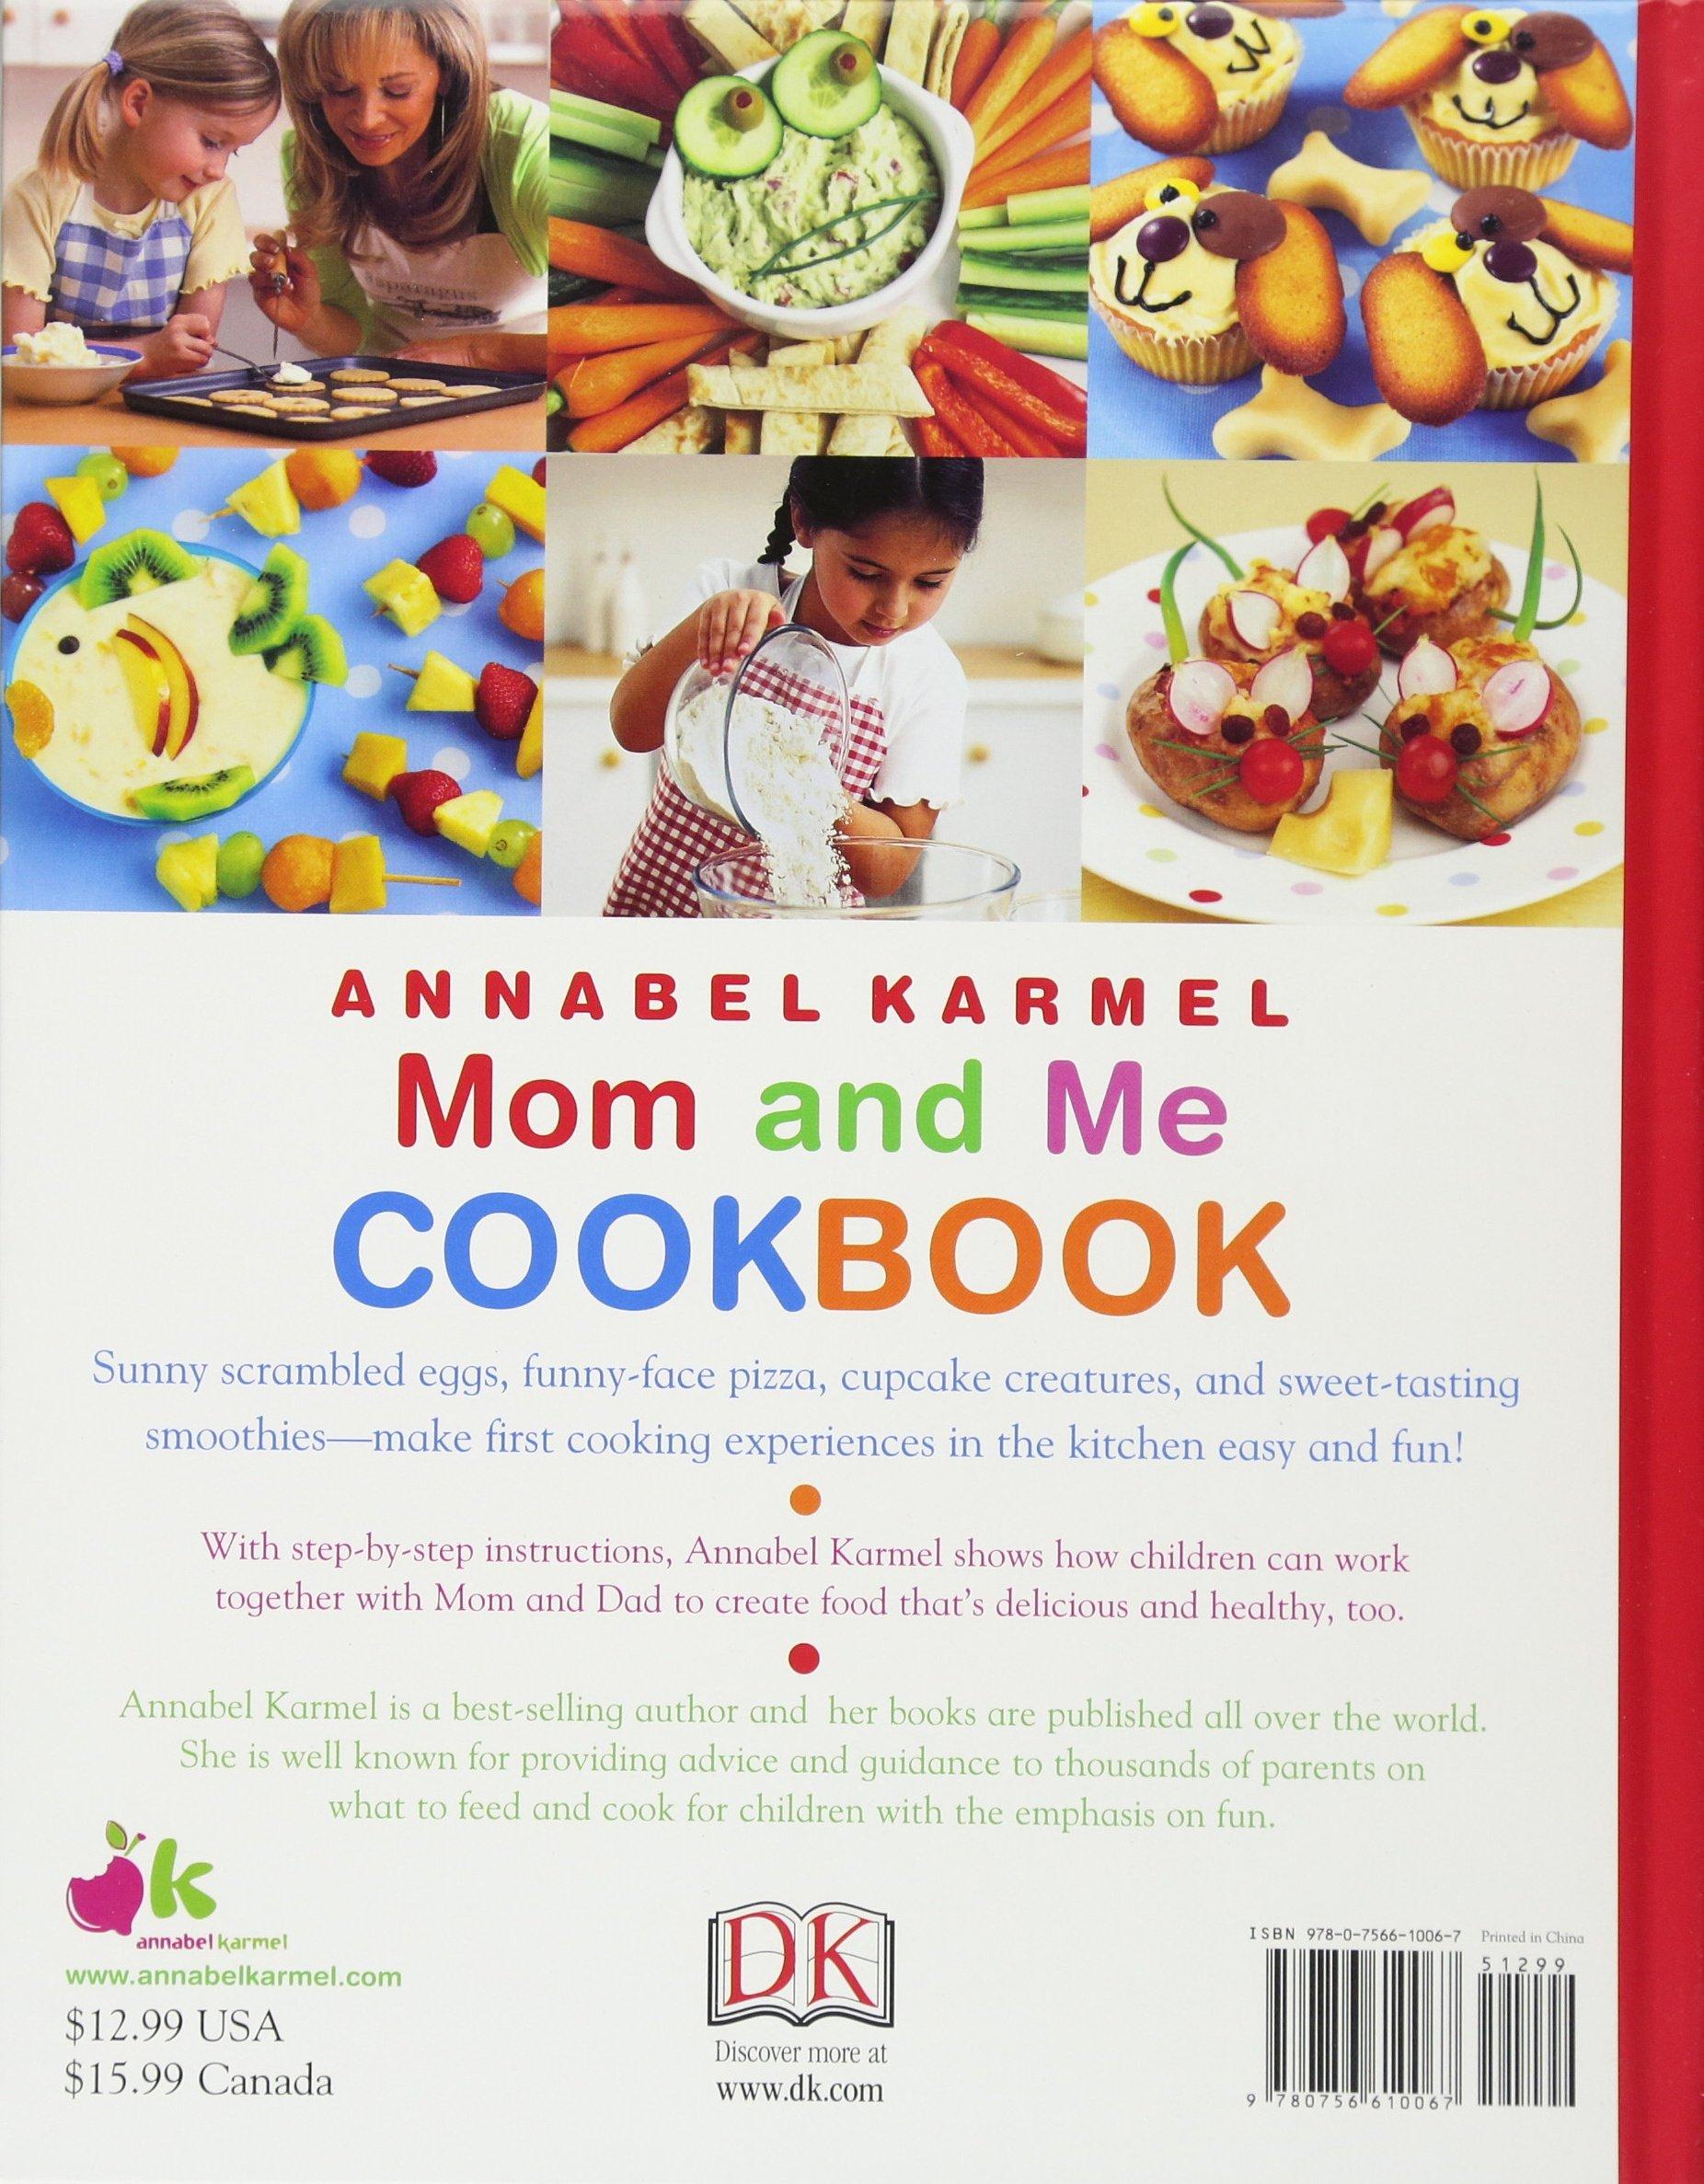 Mom and Me Cookbook: Amazon.co.uk: Annabel Karmel: 0690472010067: Books